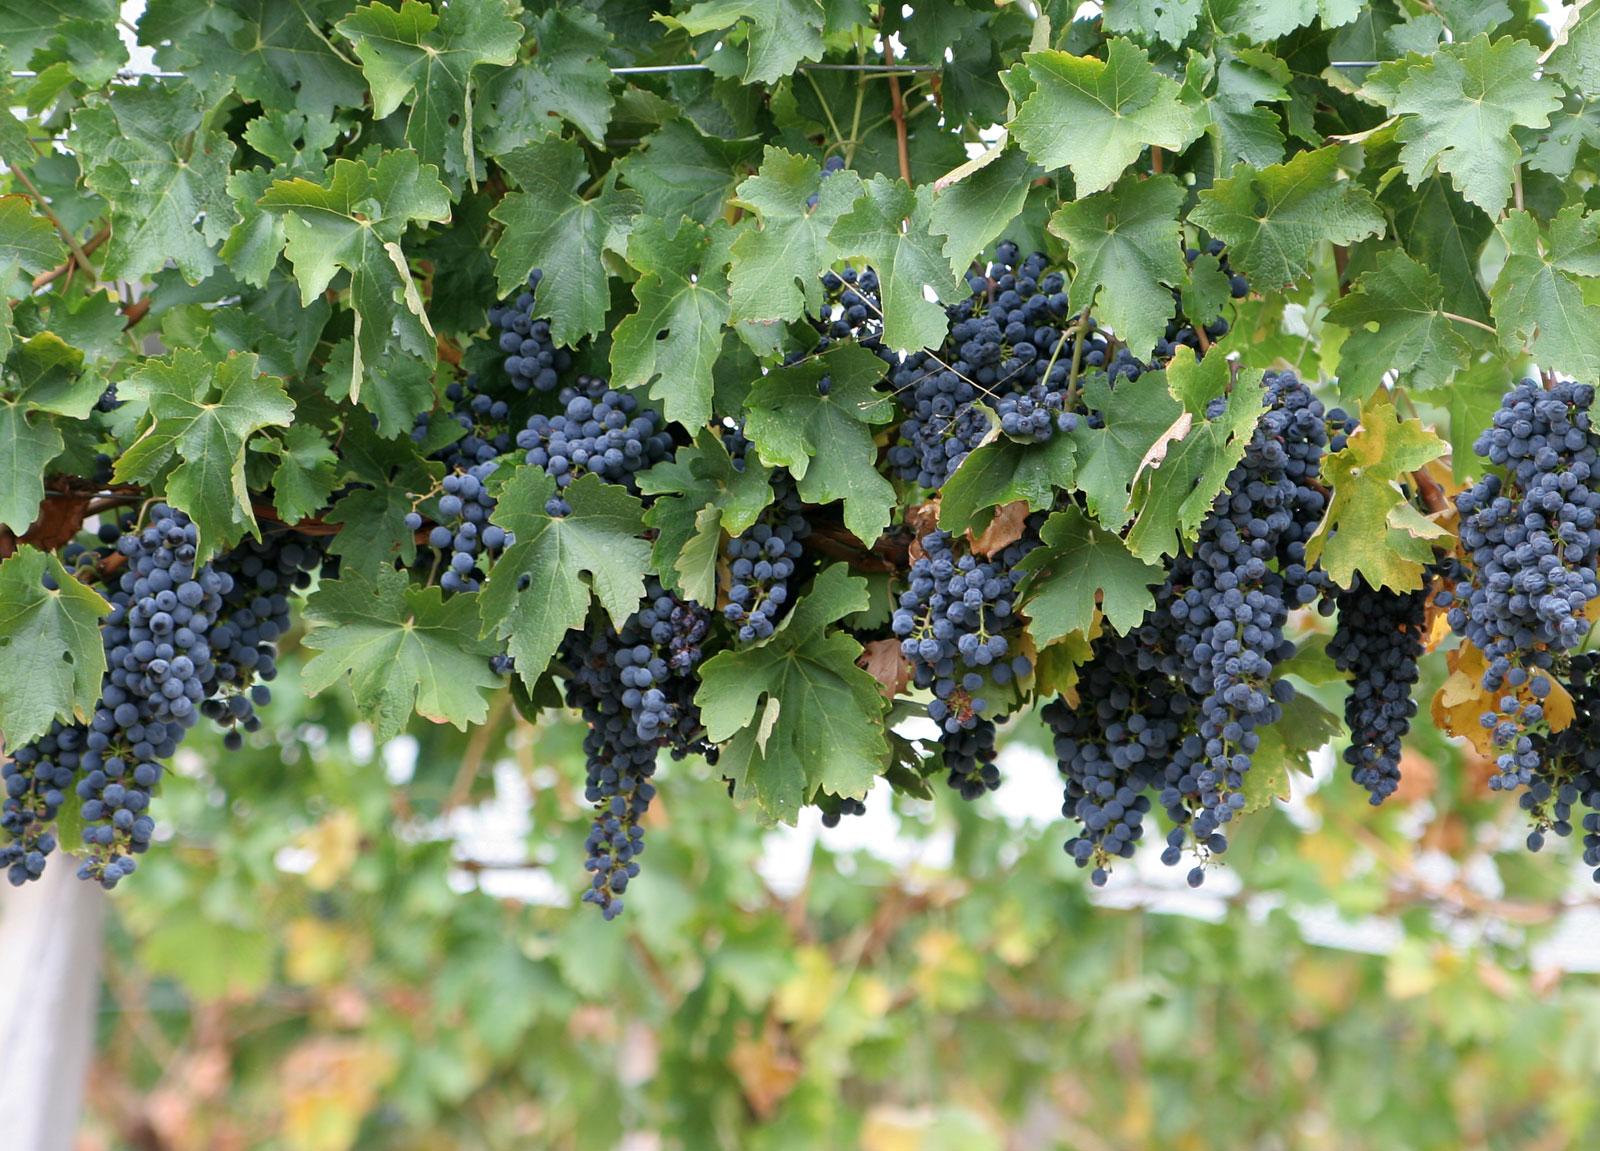 images of grape vines - photo #2